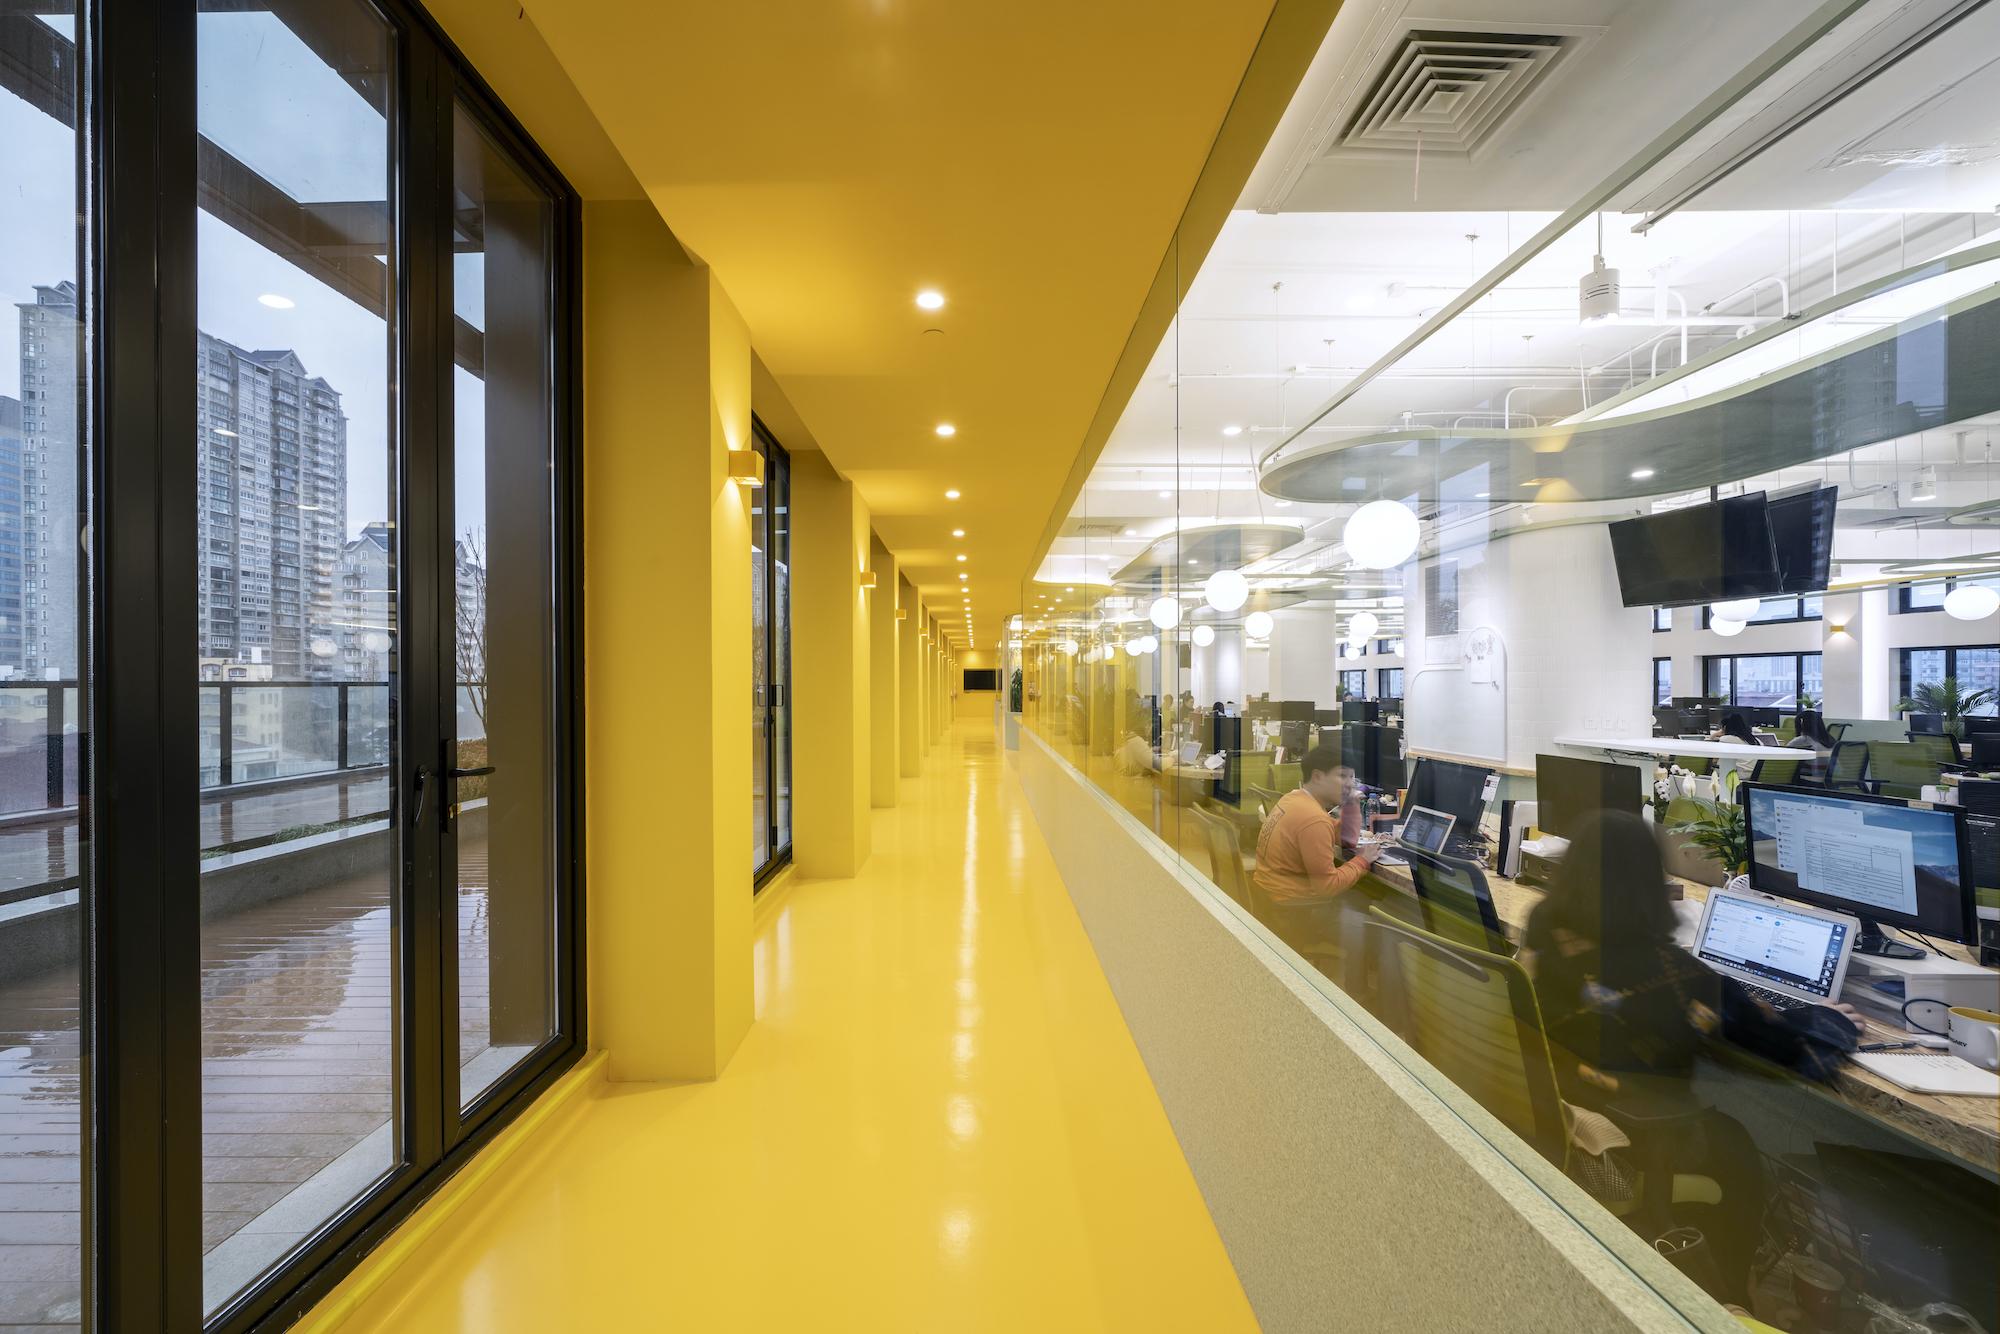 corridor painted in yellow